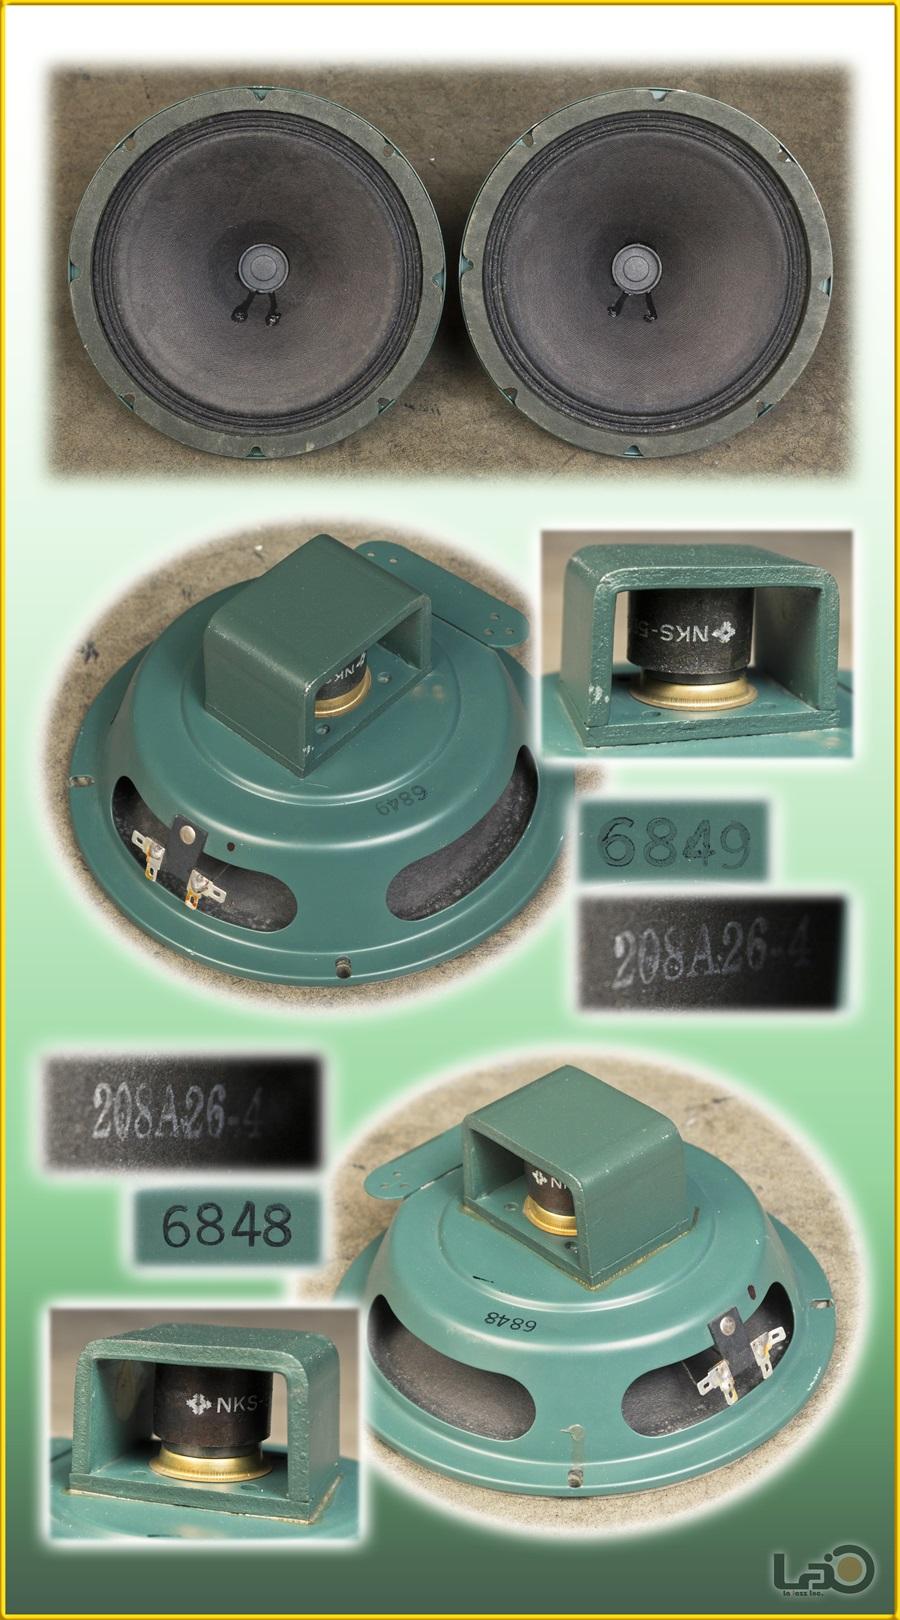 ALTEC 403A フルレンジ・ユニット + アルテックオリジナル工業用・キャビネット13